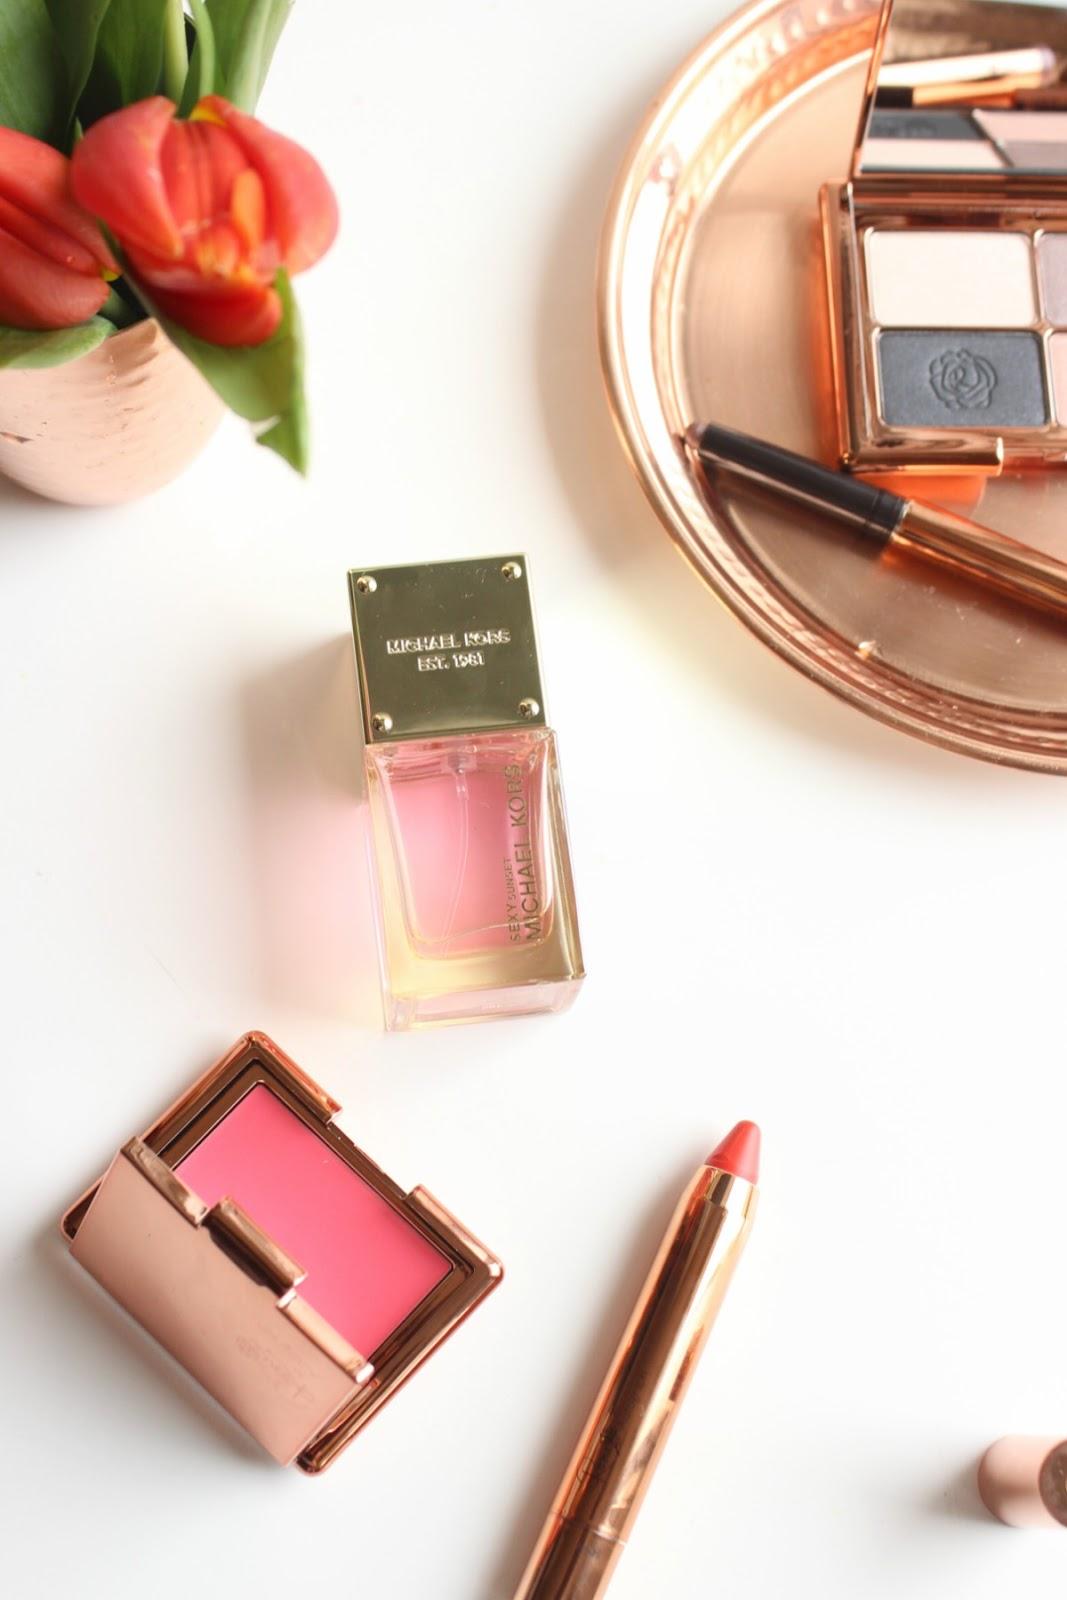 Michael Kors Sexy Sunset Eau de Parfum